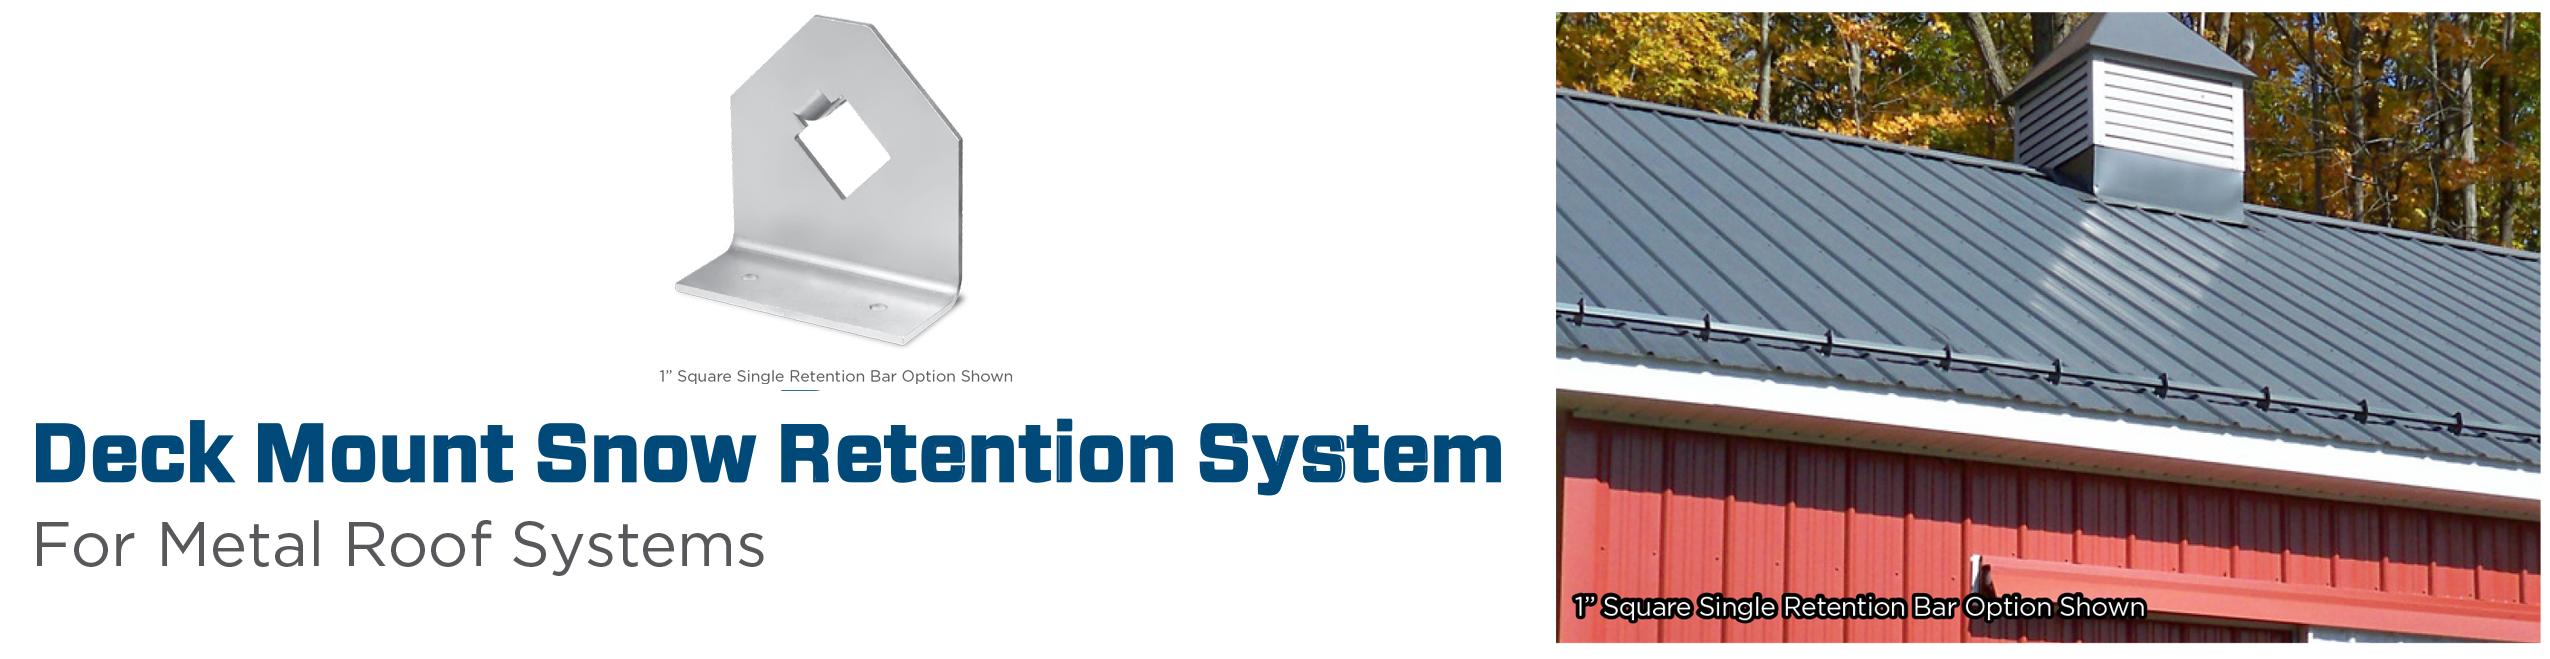 Deci Mount Snow Retention System